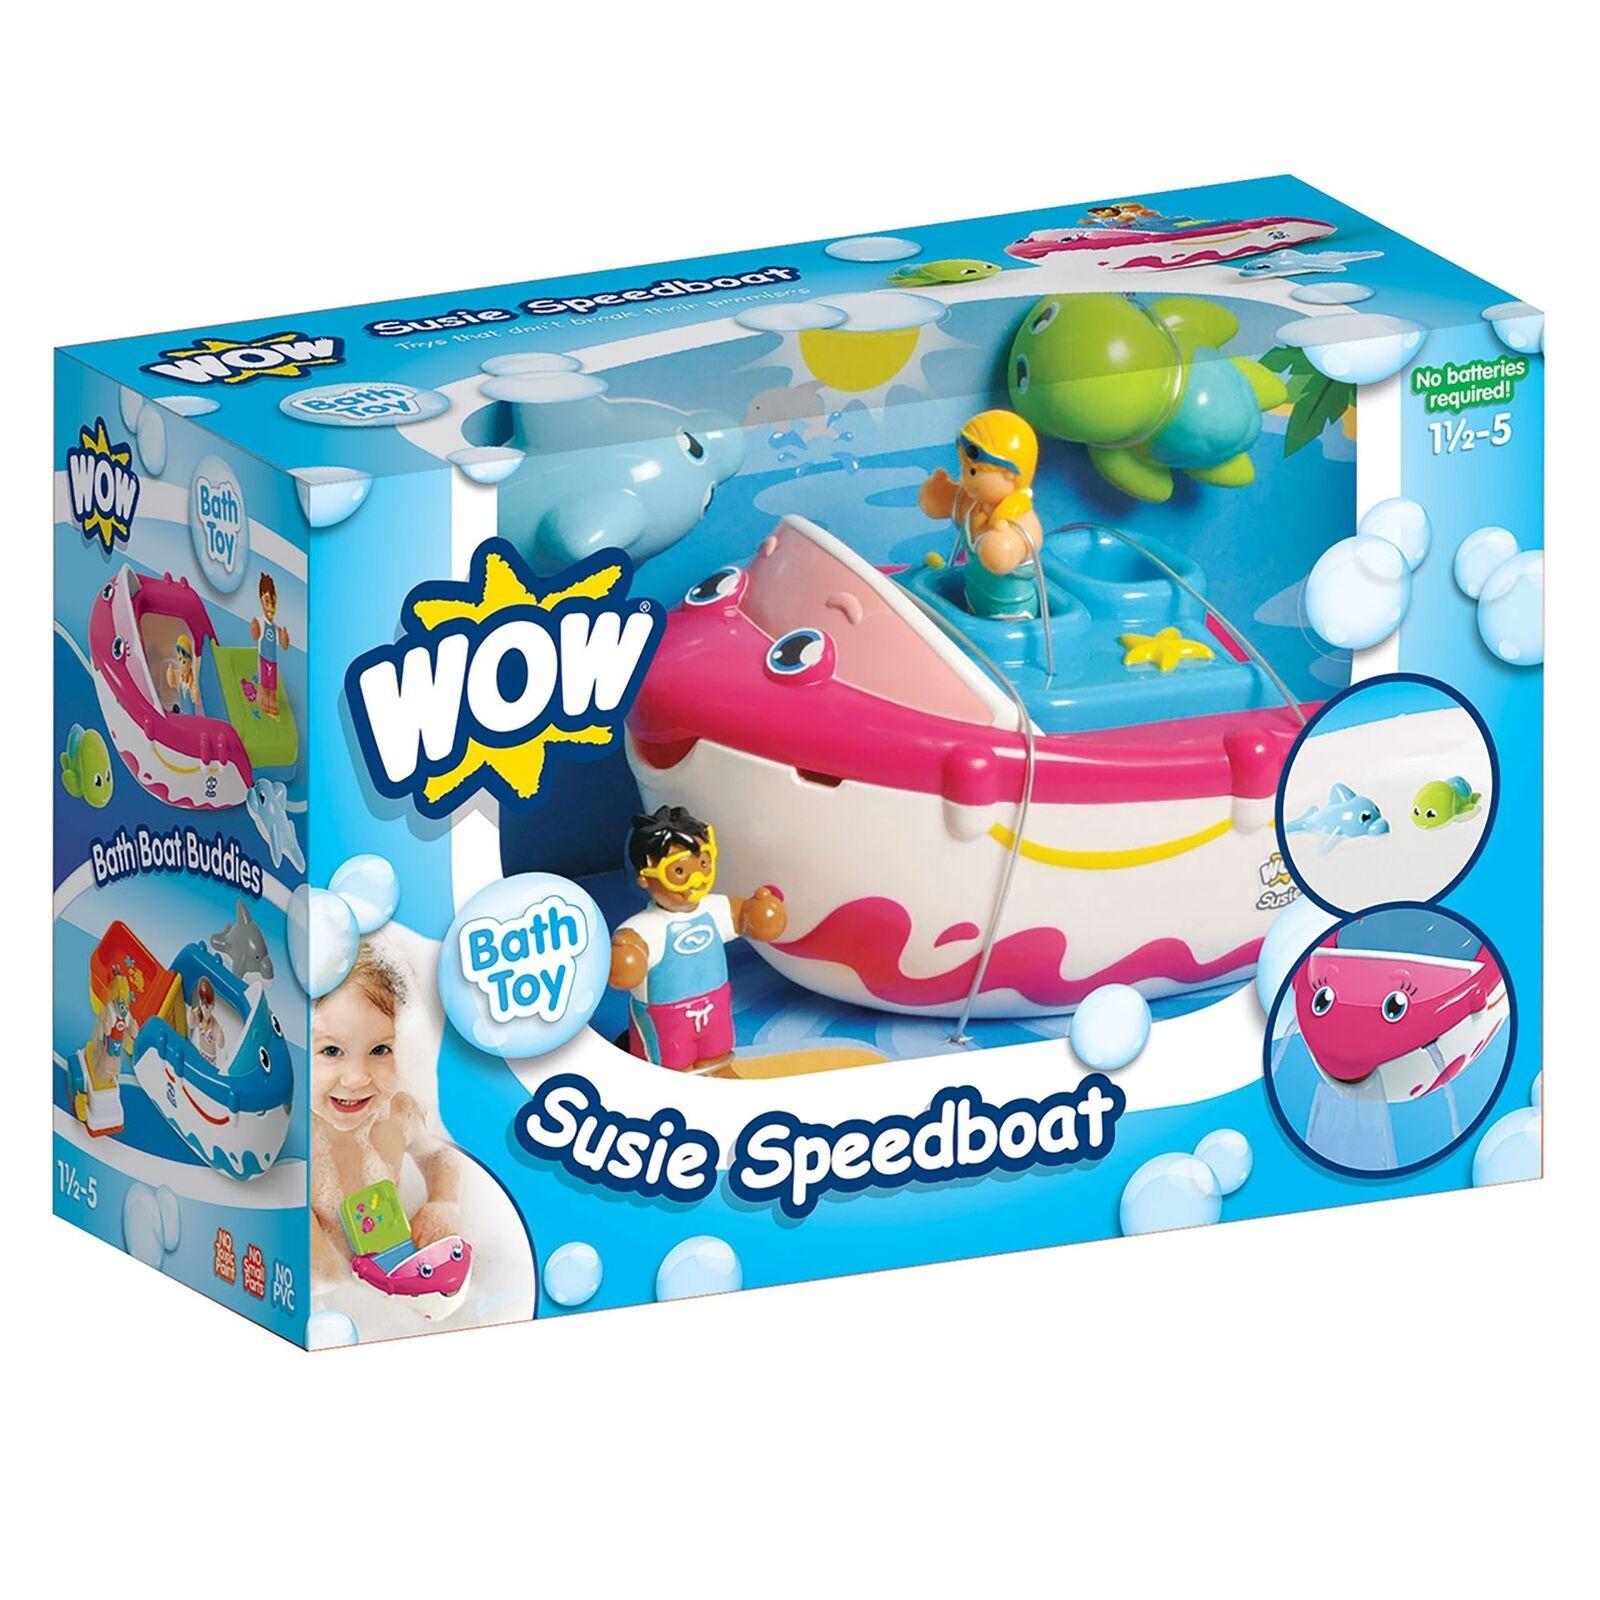 Susie Speedboat 106901 5033491106901 by WOW Toys | eBay